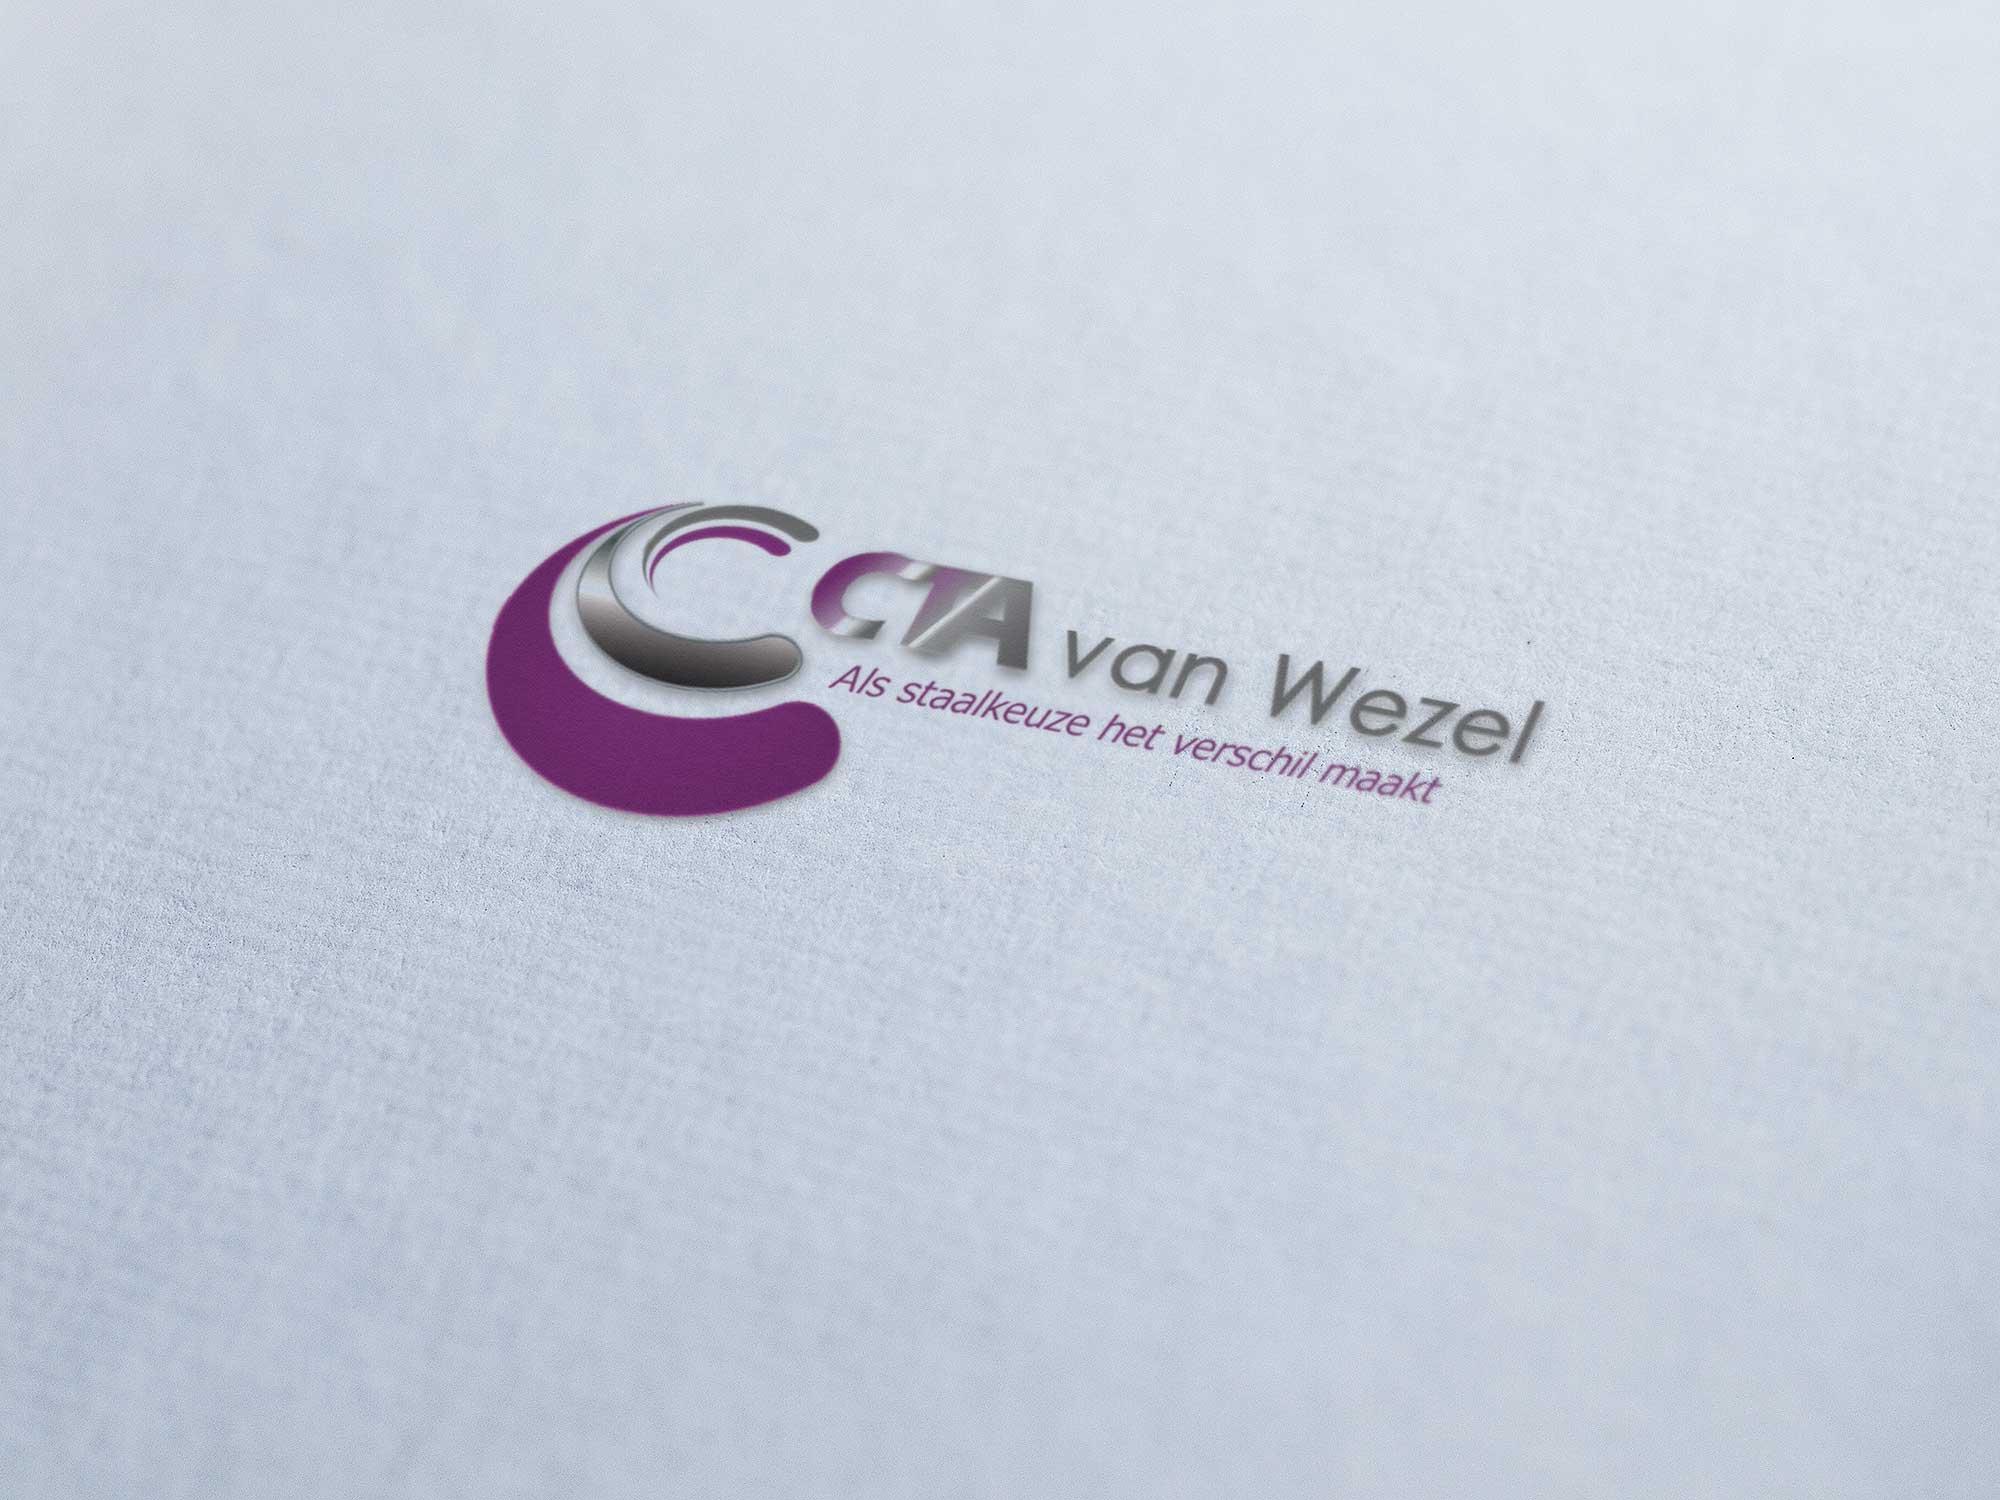 Logo CTA van Wezel Winterswijk